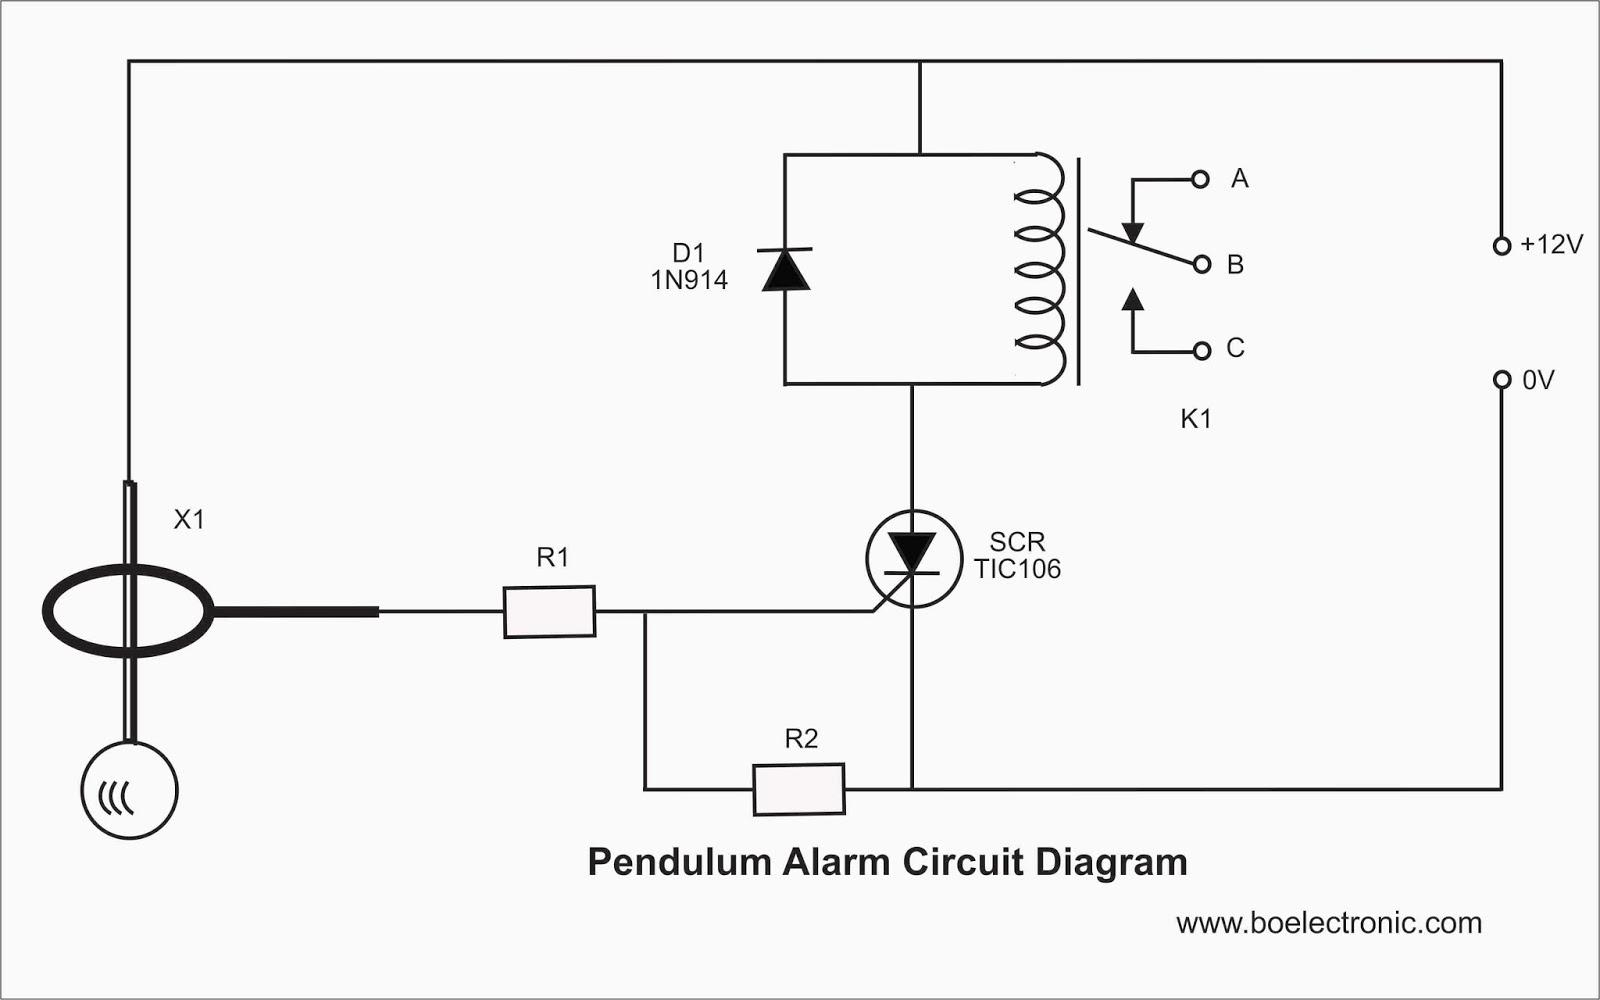 ge washer wiring diagram 175d2750g352 [ 1600 x 1000 Pixel ]